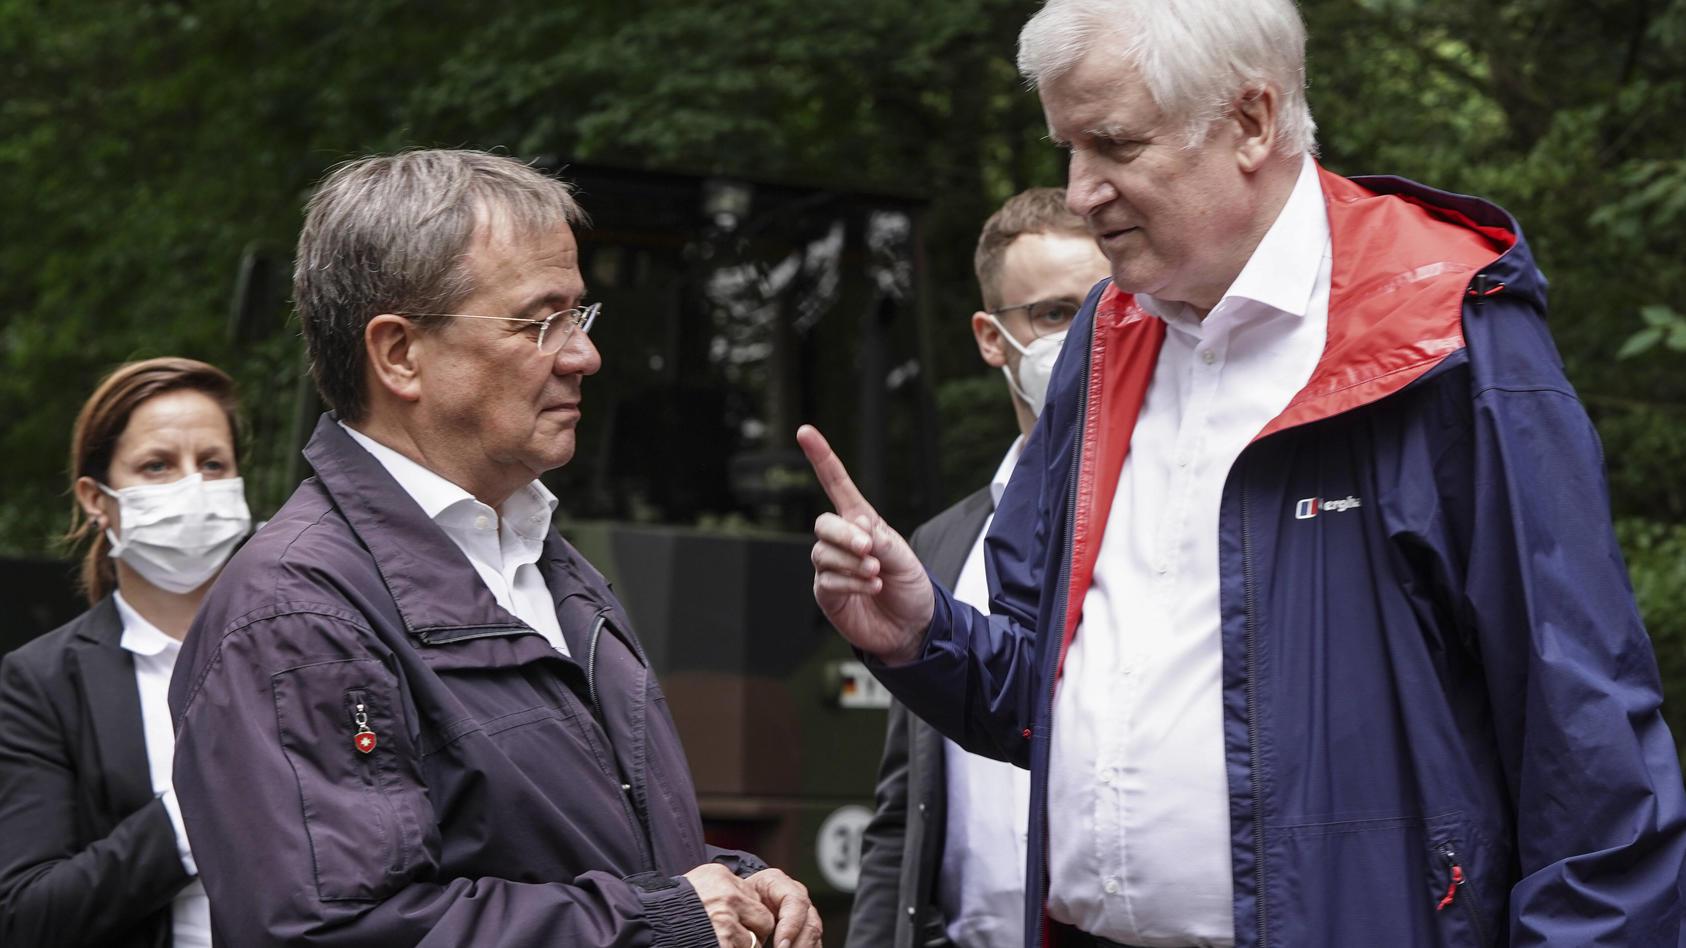 Armin Laschet und Horst Seehofer (rechts) im Gespräch.